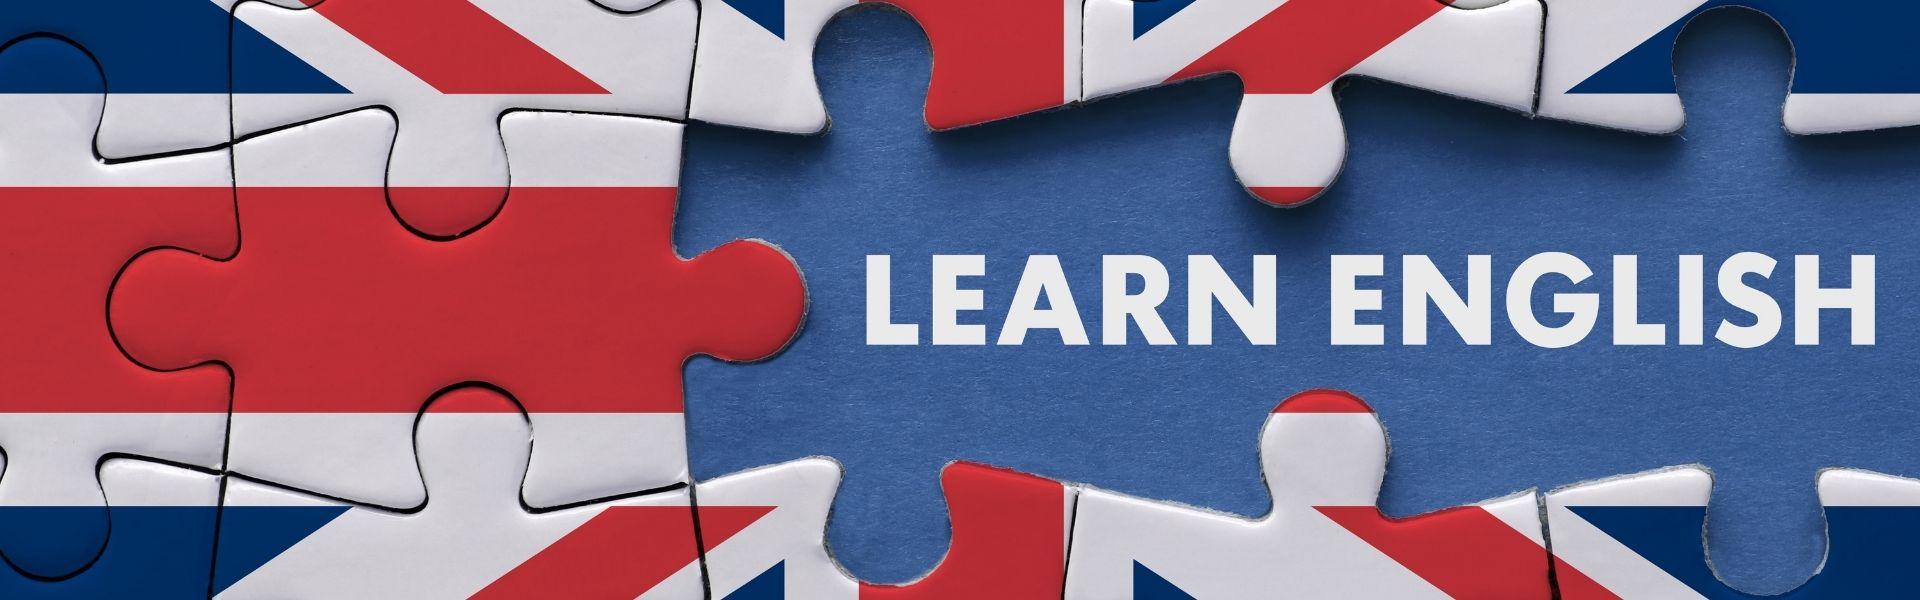 banner - learn english